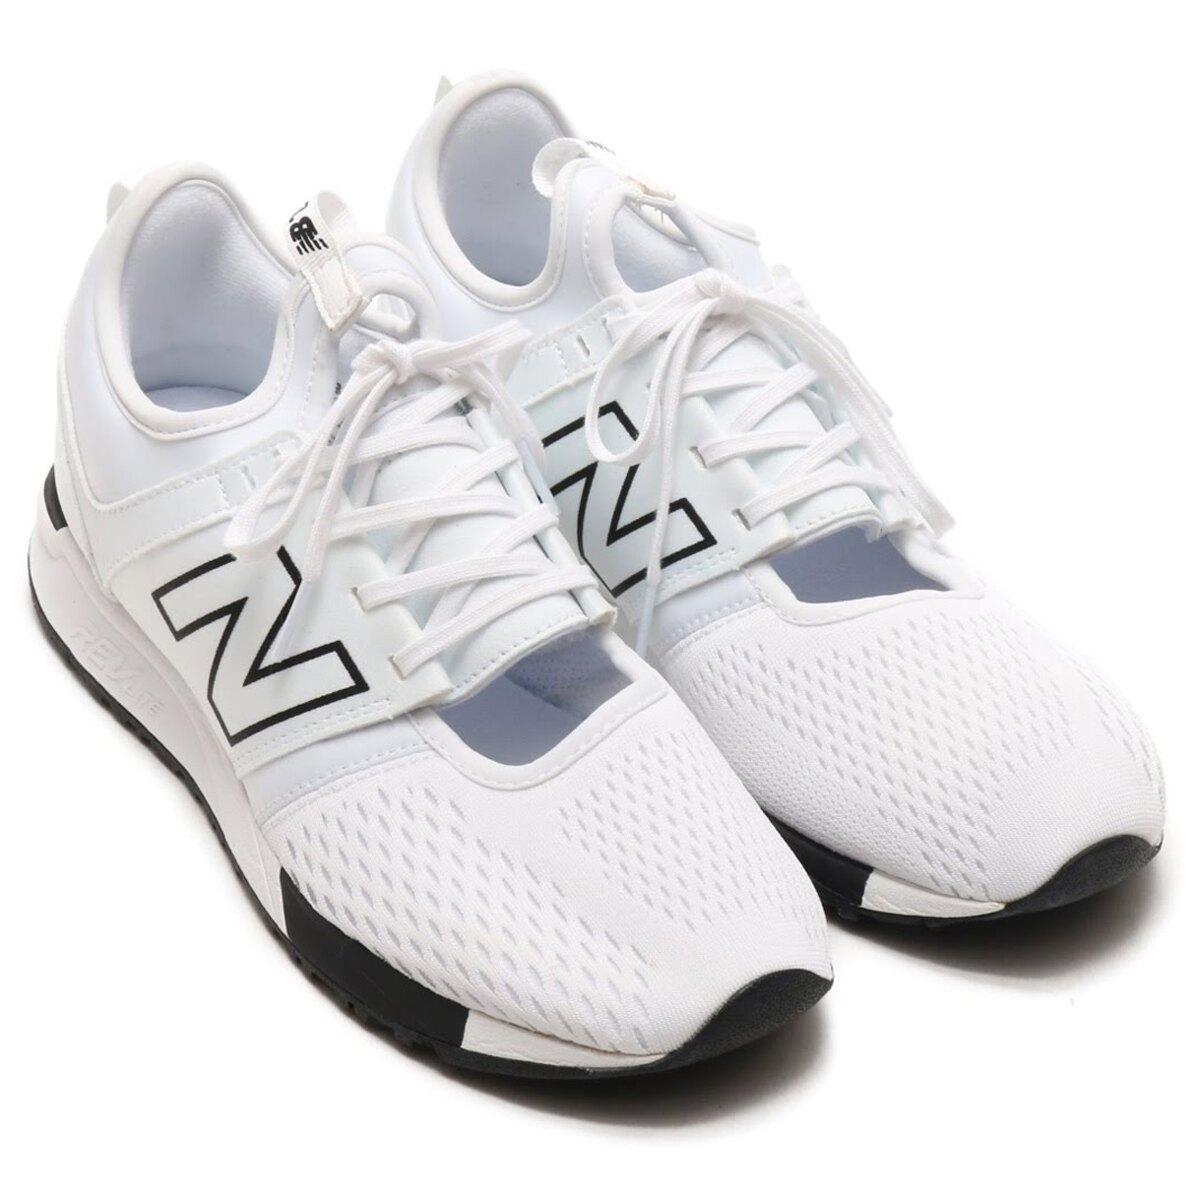 New Balance 247 男鞋 女鞋 休閒 網布 輕量 透氣 白 黑【運動世界】MRL247SQ